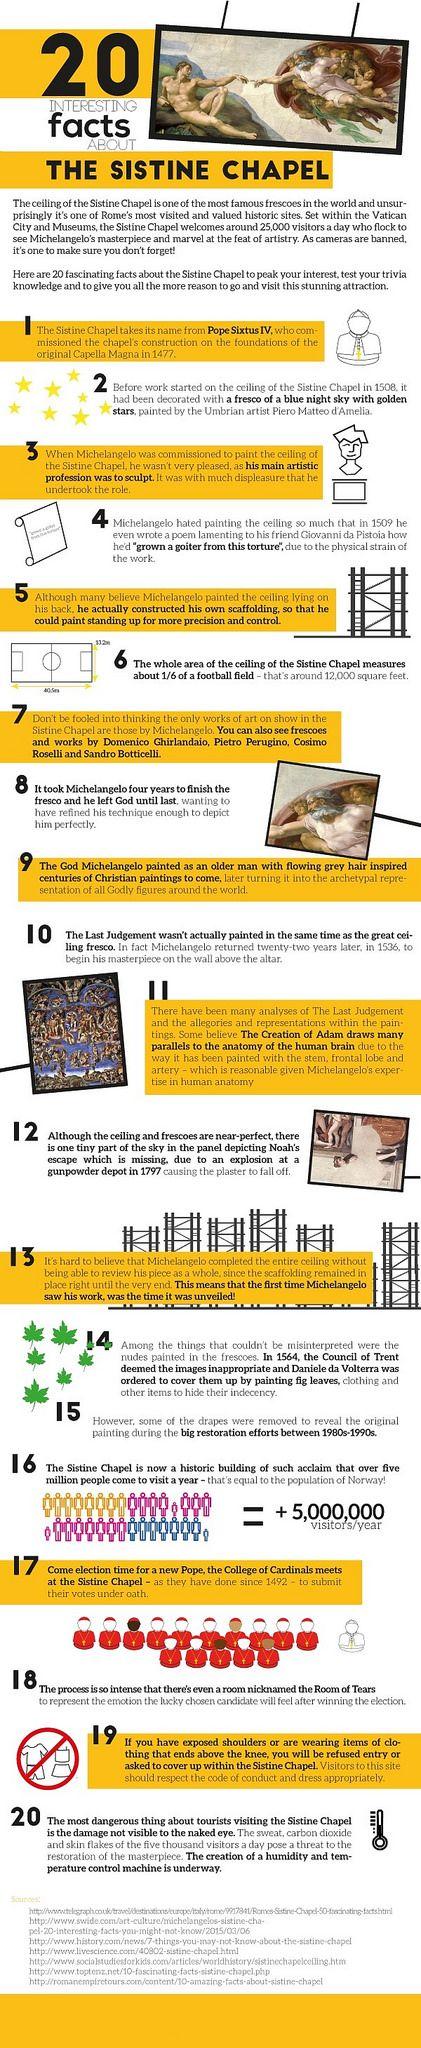 Sistine Chapel infographic